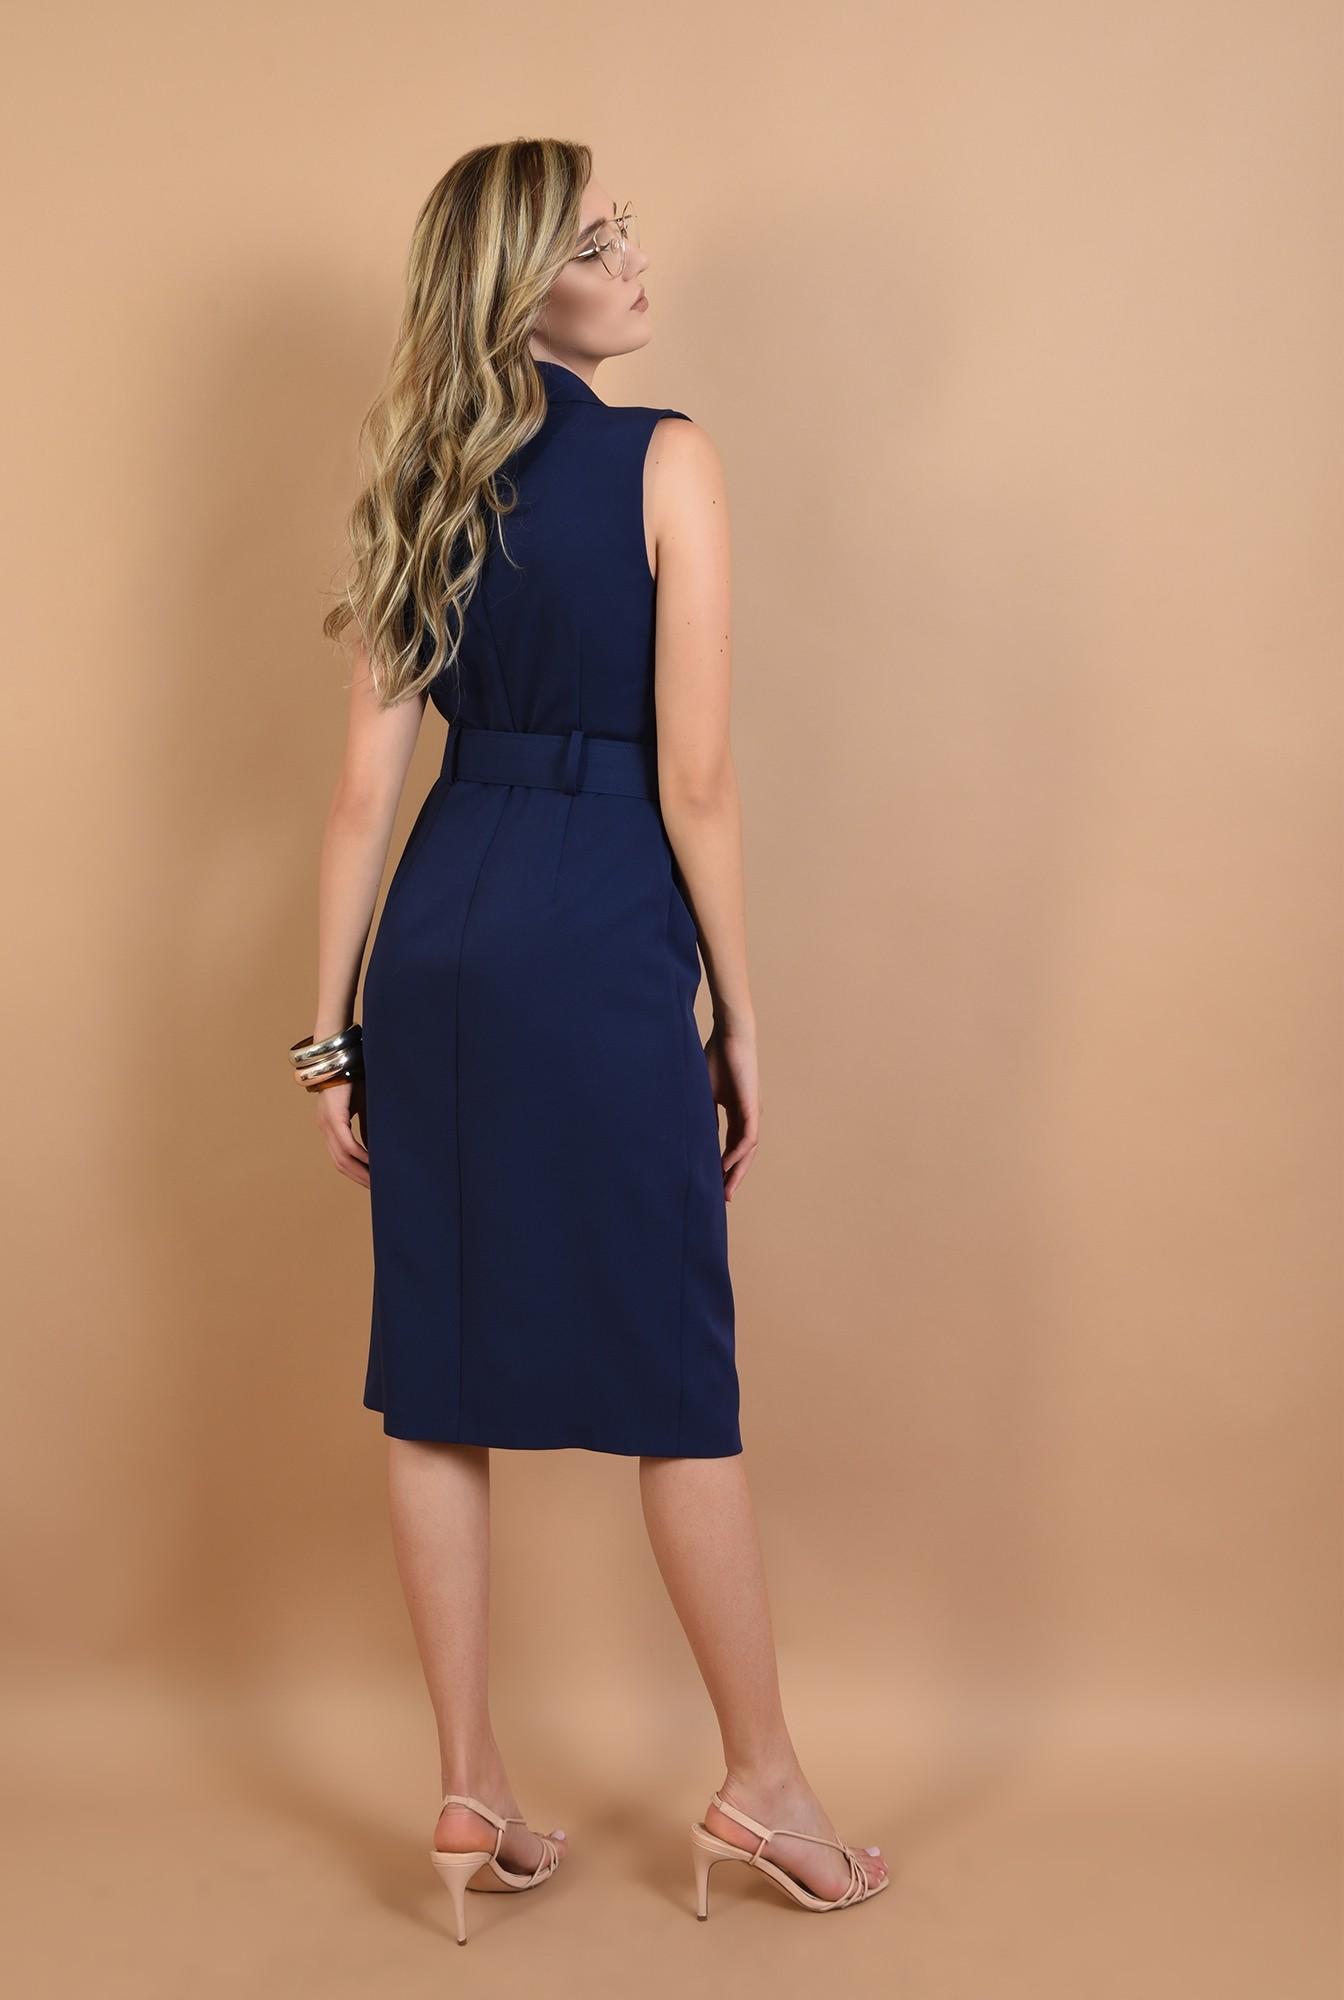 1 - 360 - rochie conica, bleumarin, cu nasturi, stil sacou, Poema